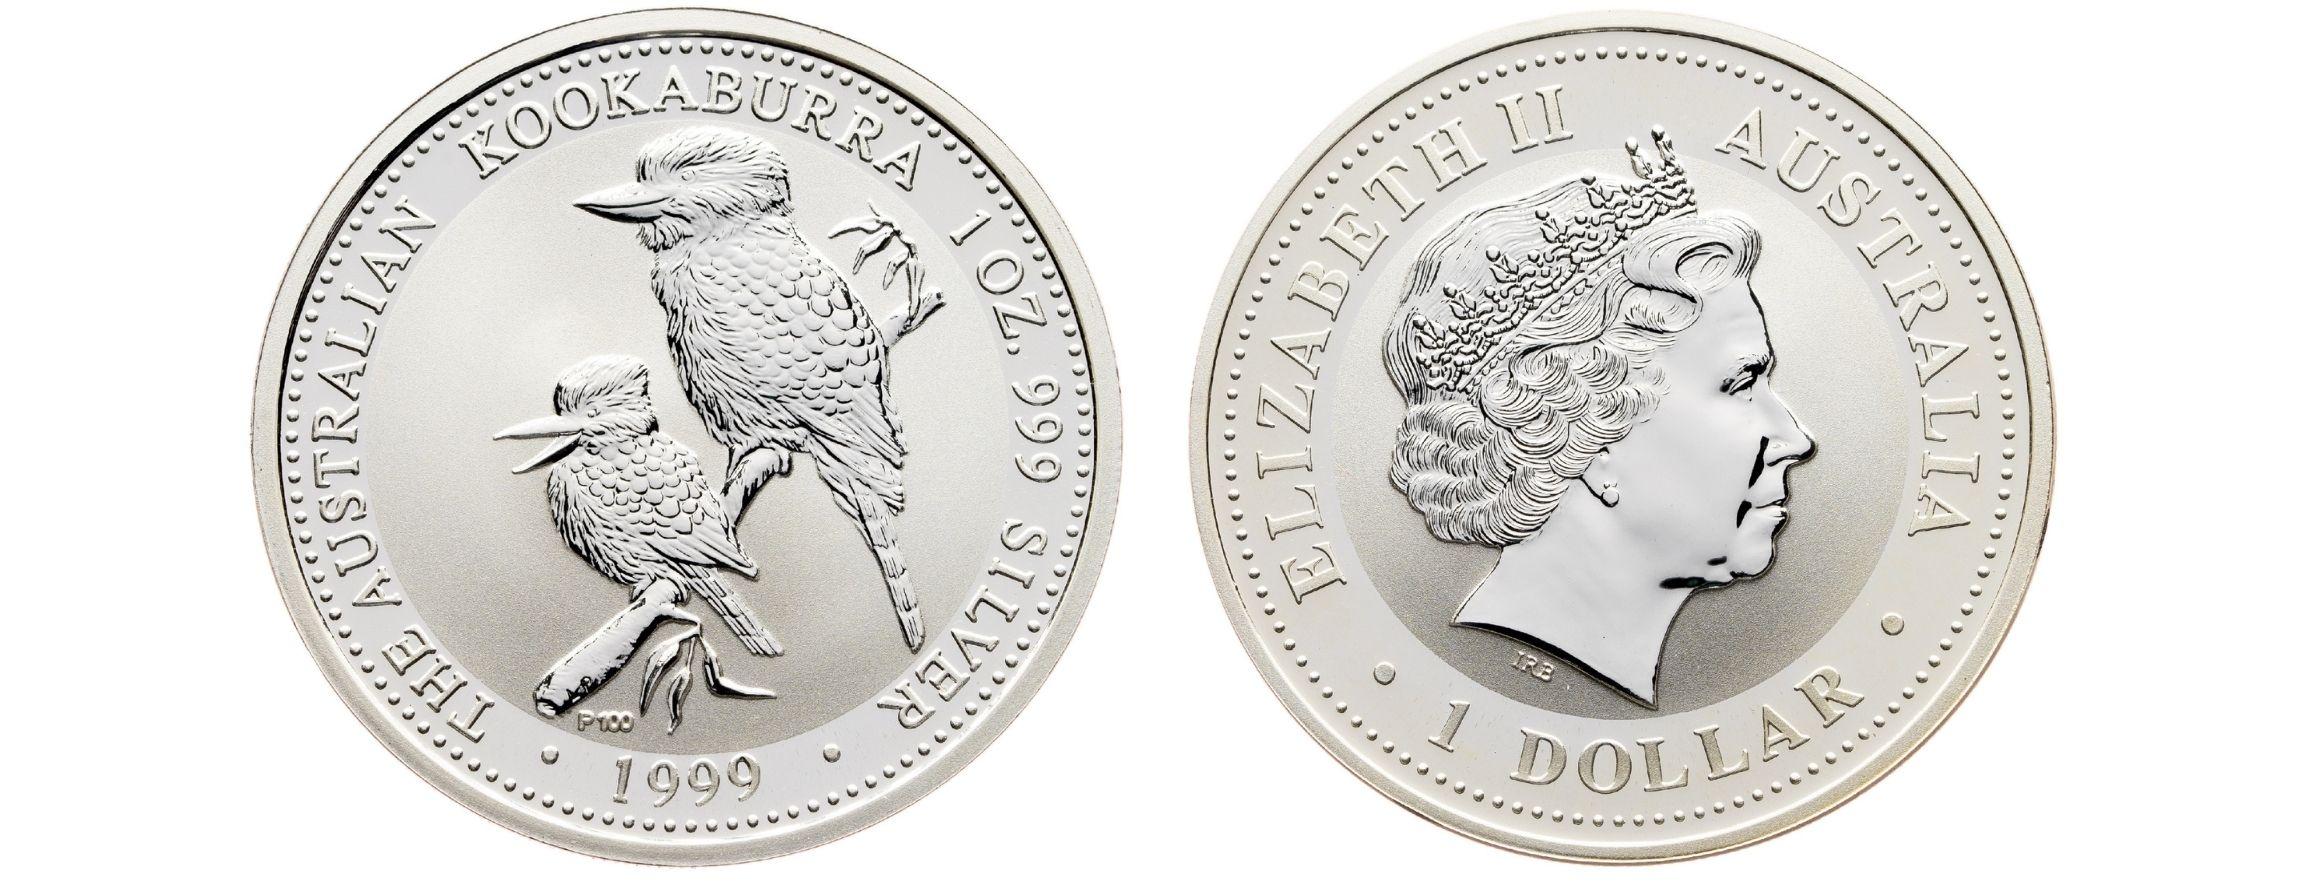 investicni-stribrna-mince-obe-strany